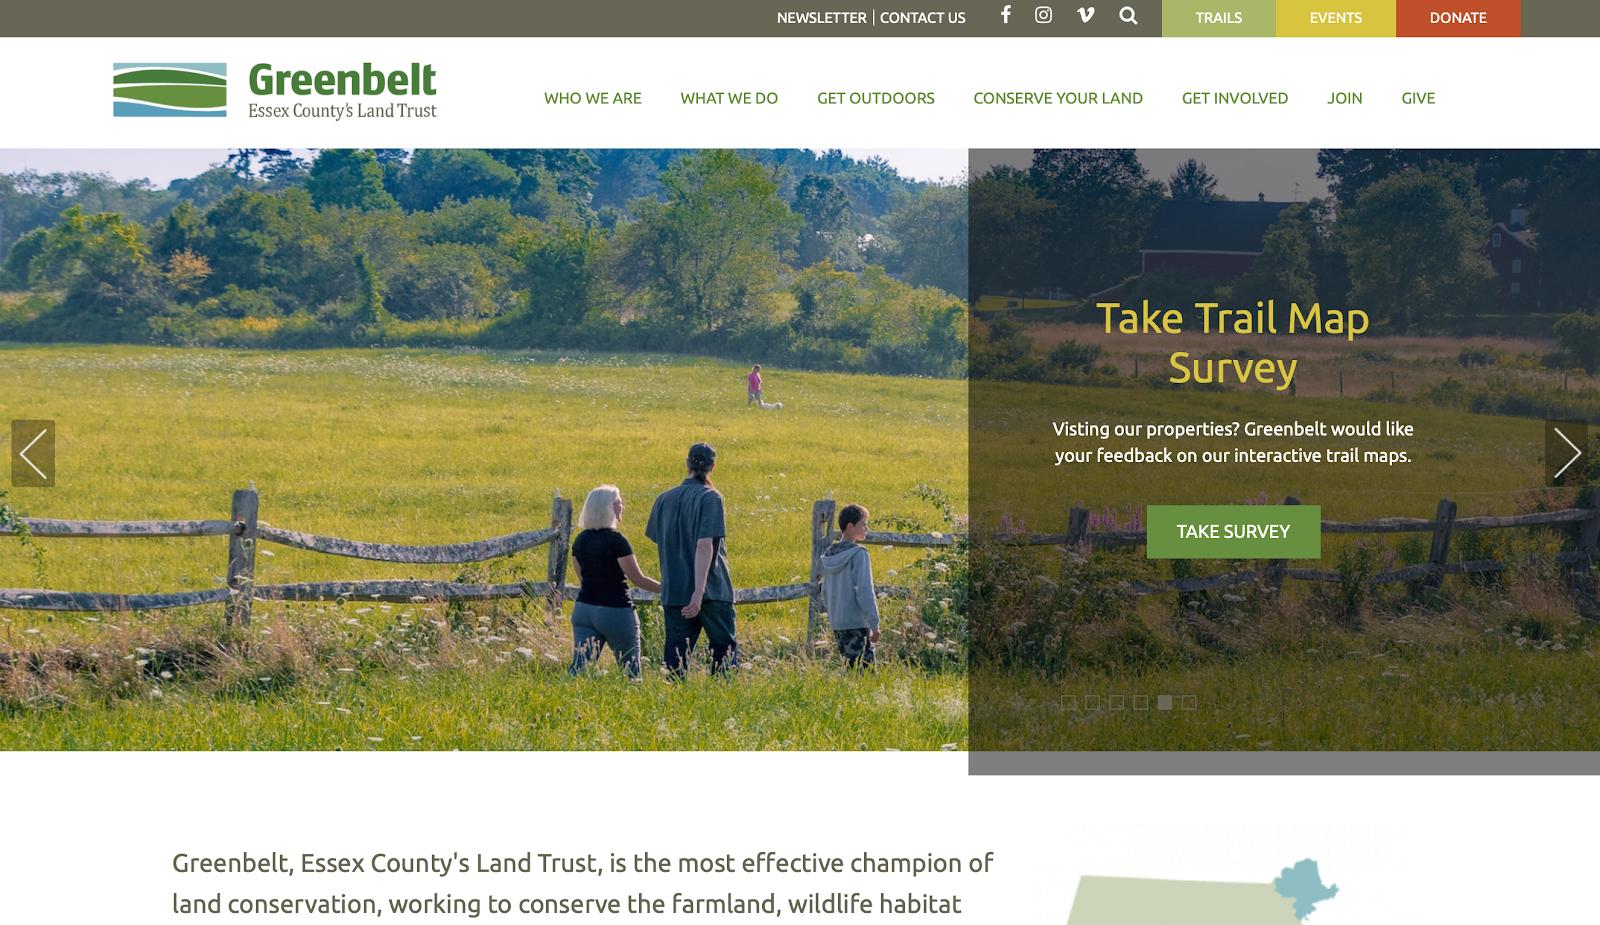 Nonprofit Website Examples To Inspire